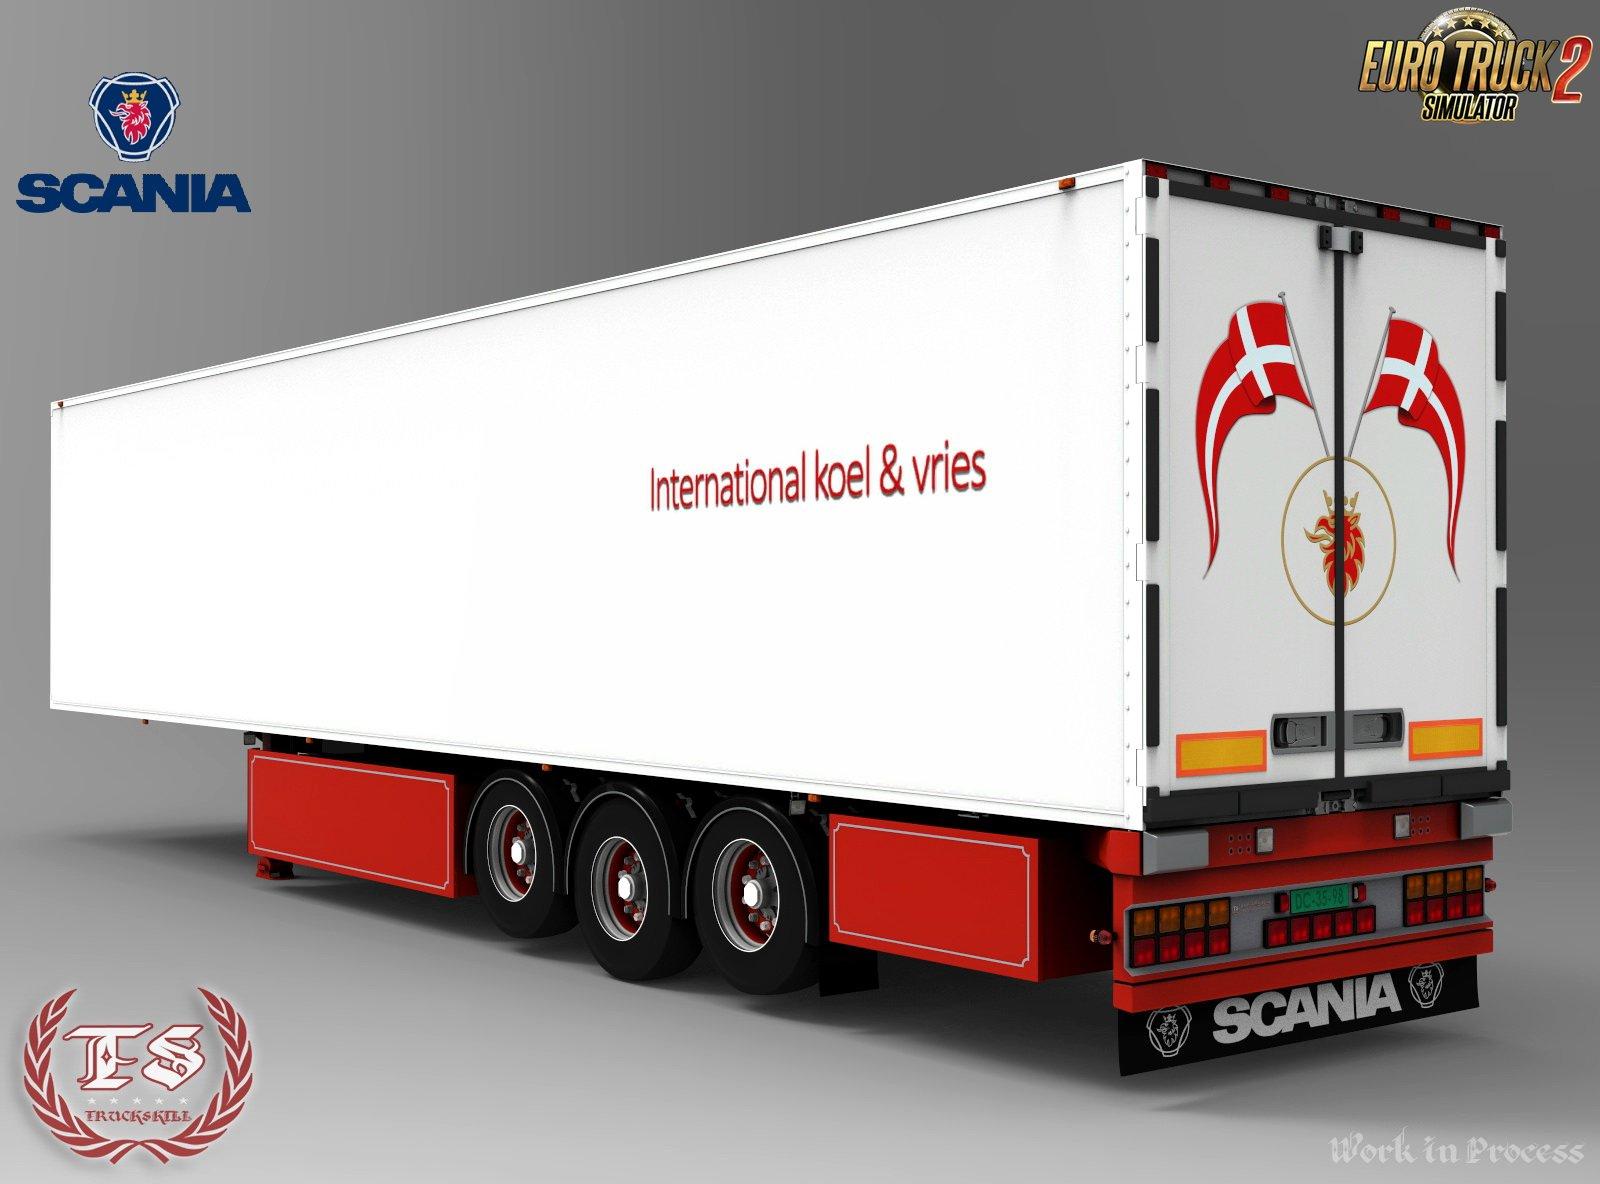 Scania Jesper Hansen Edition + Trailer v1.0 (1.28.x)